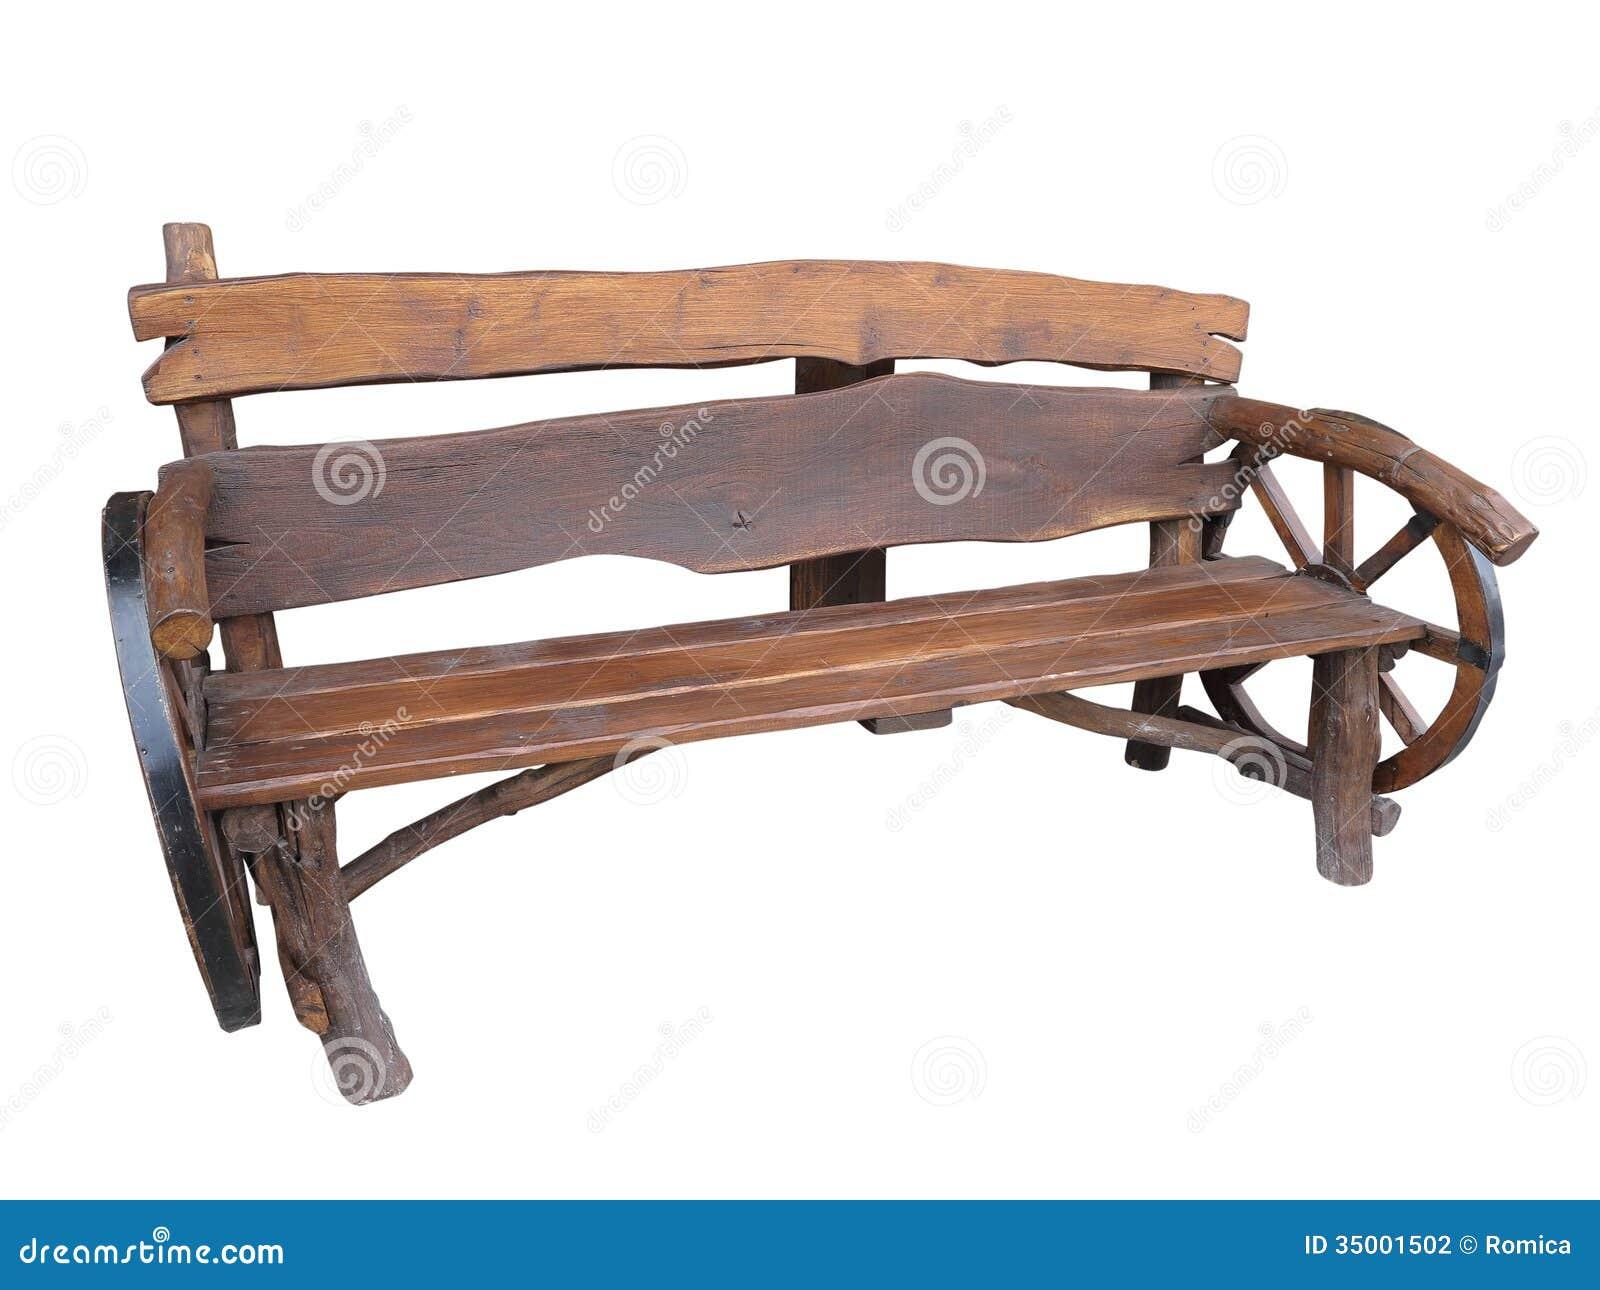 Wooden Handmade Garden Bench With Cart Wheel Decoration